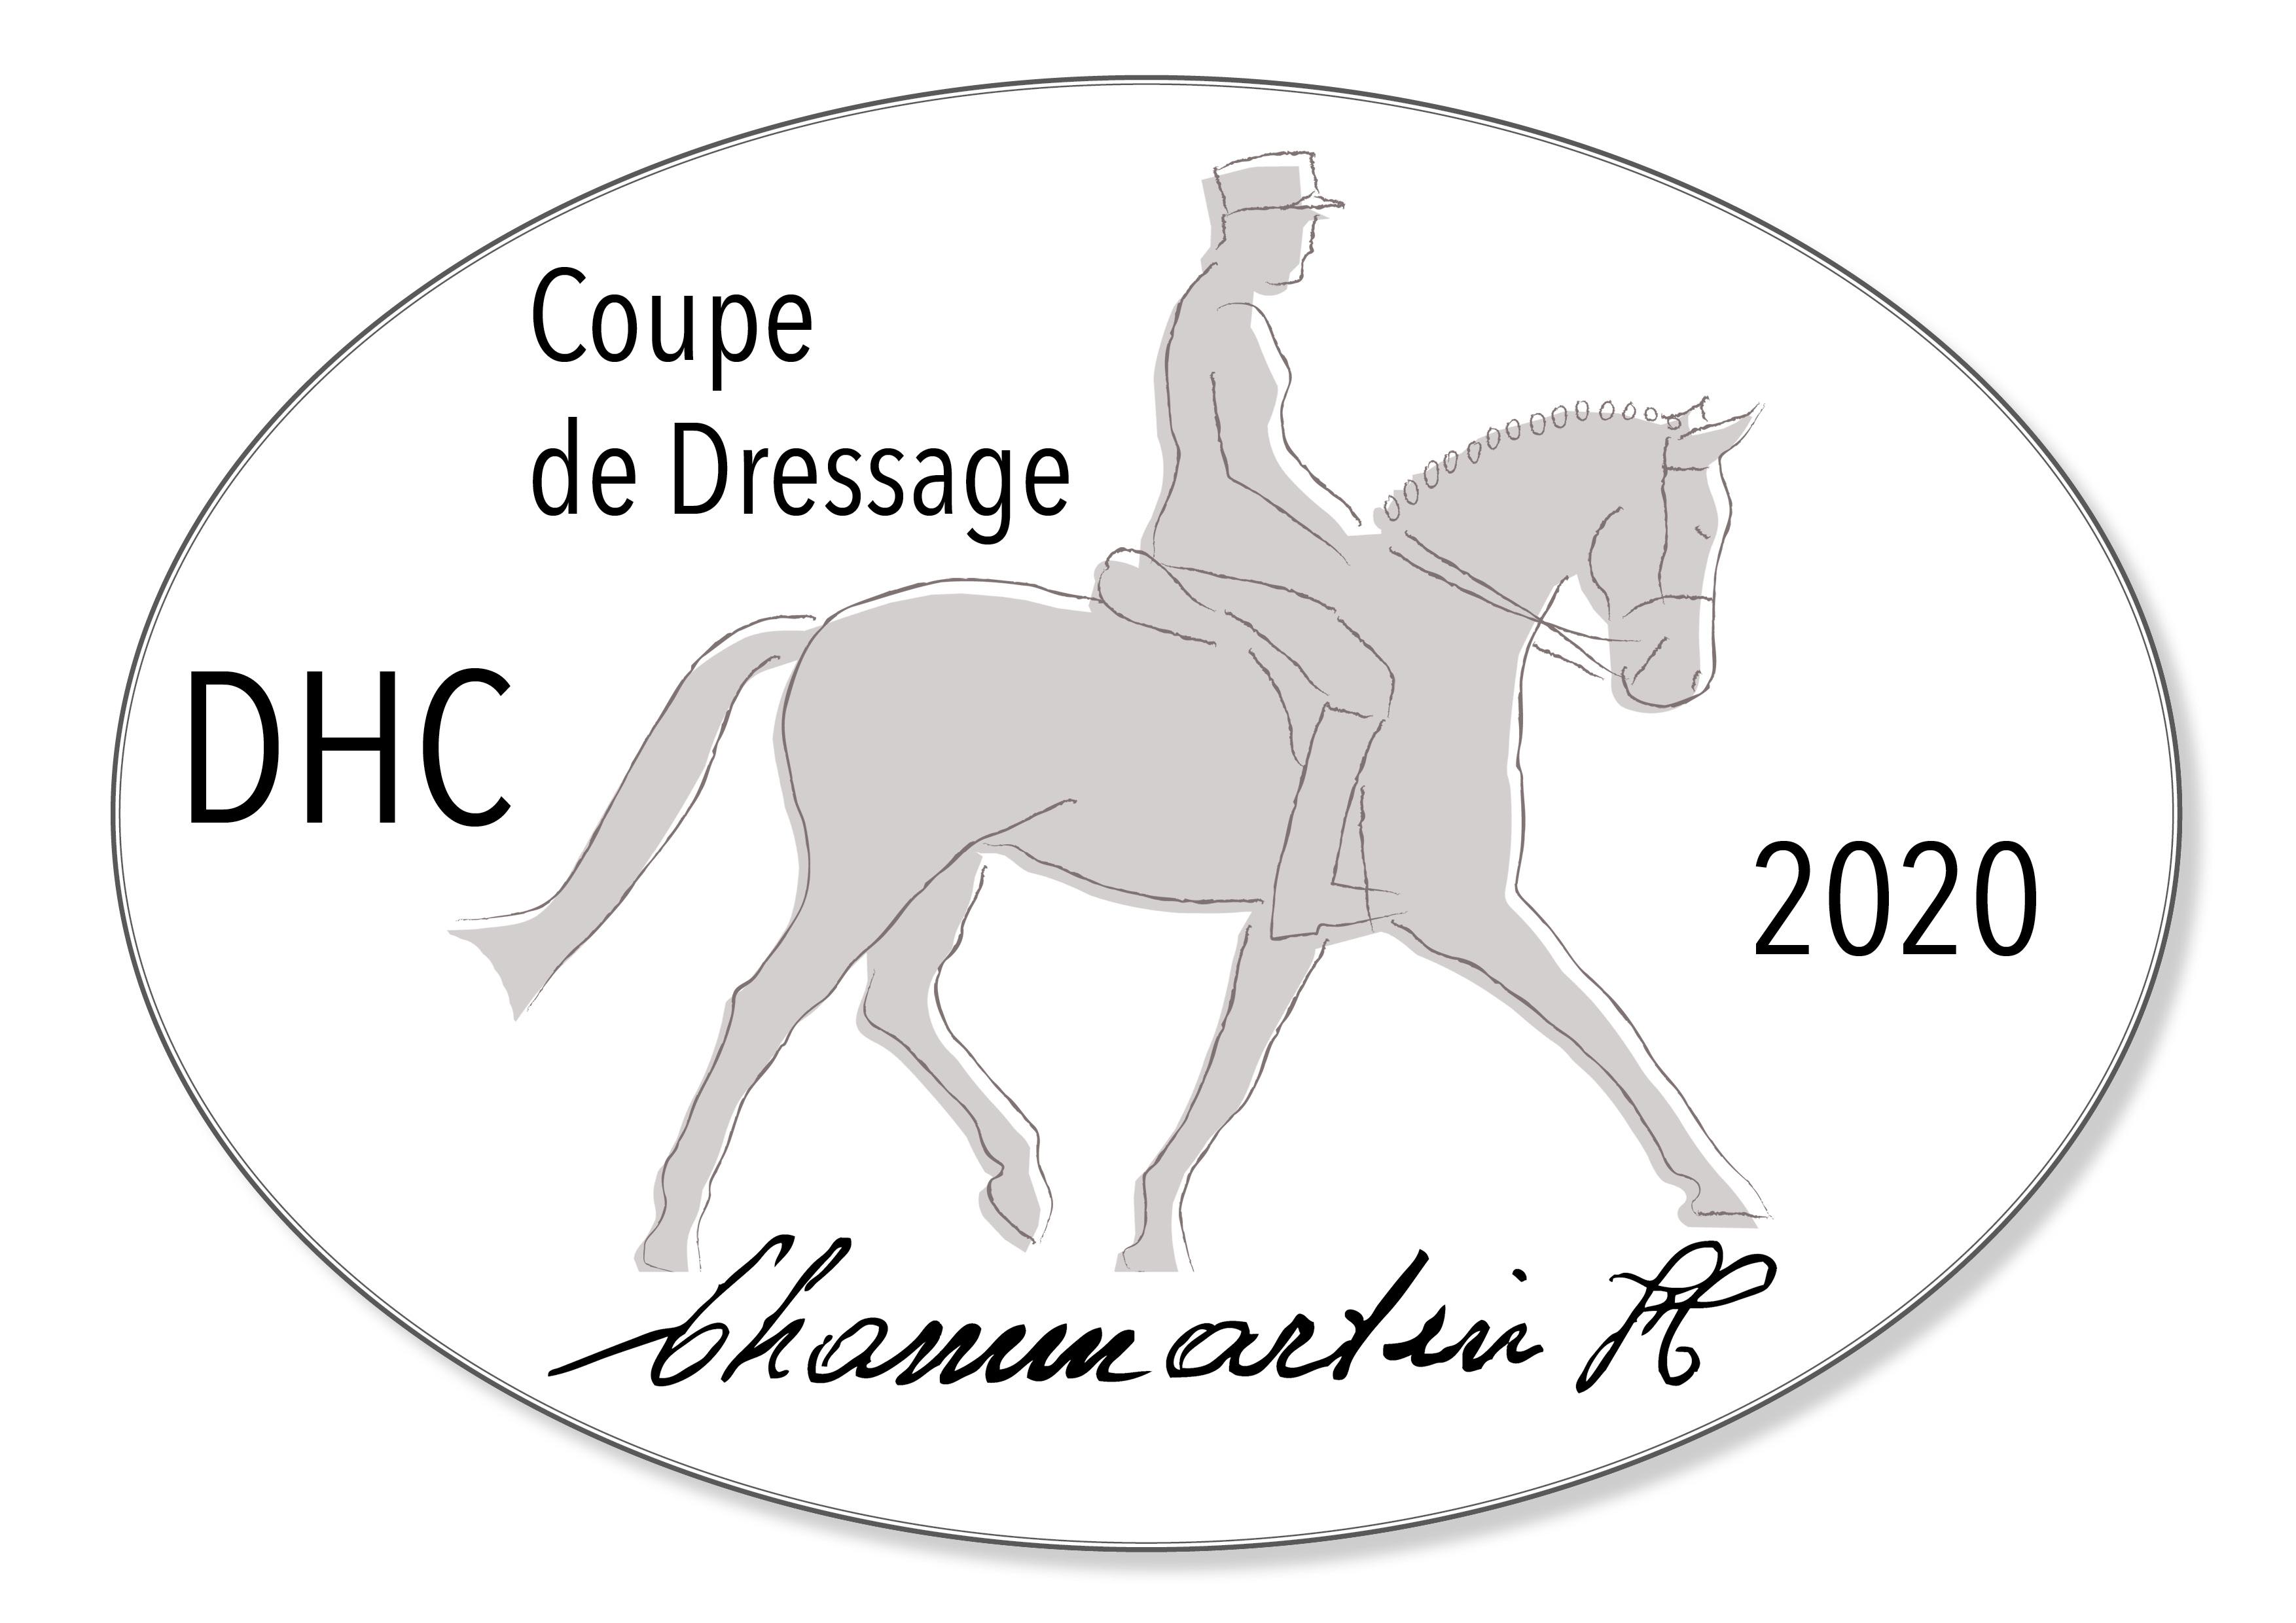 logo DHC 2020